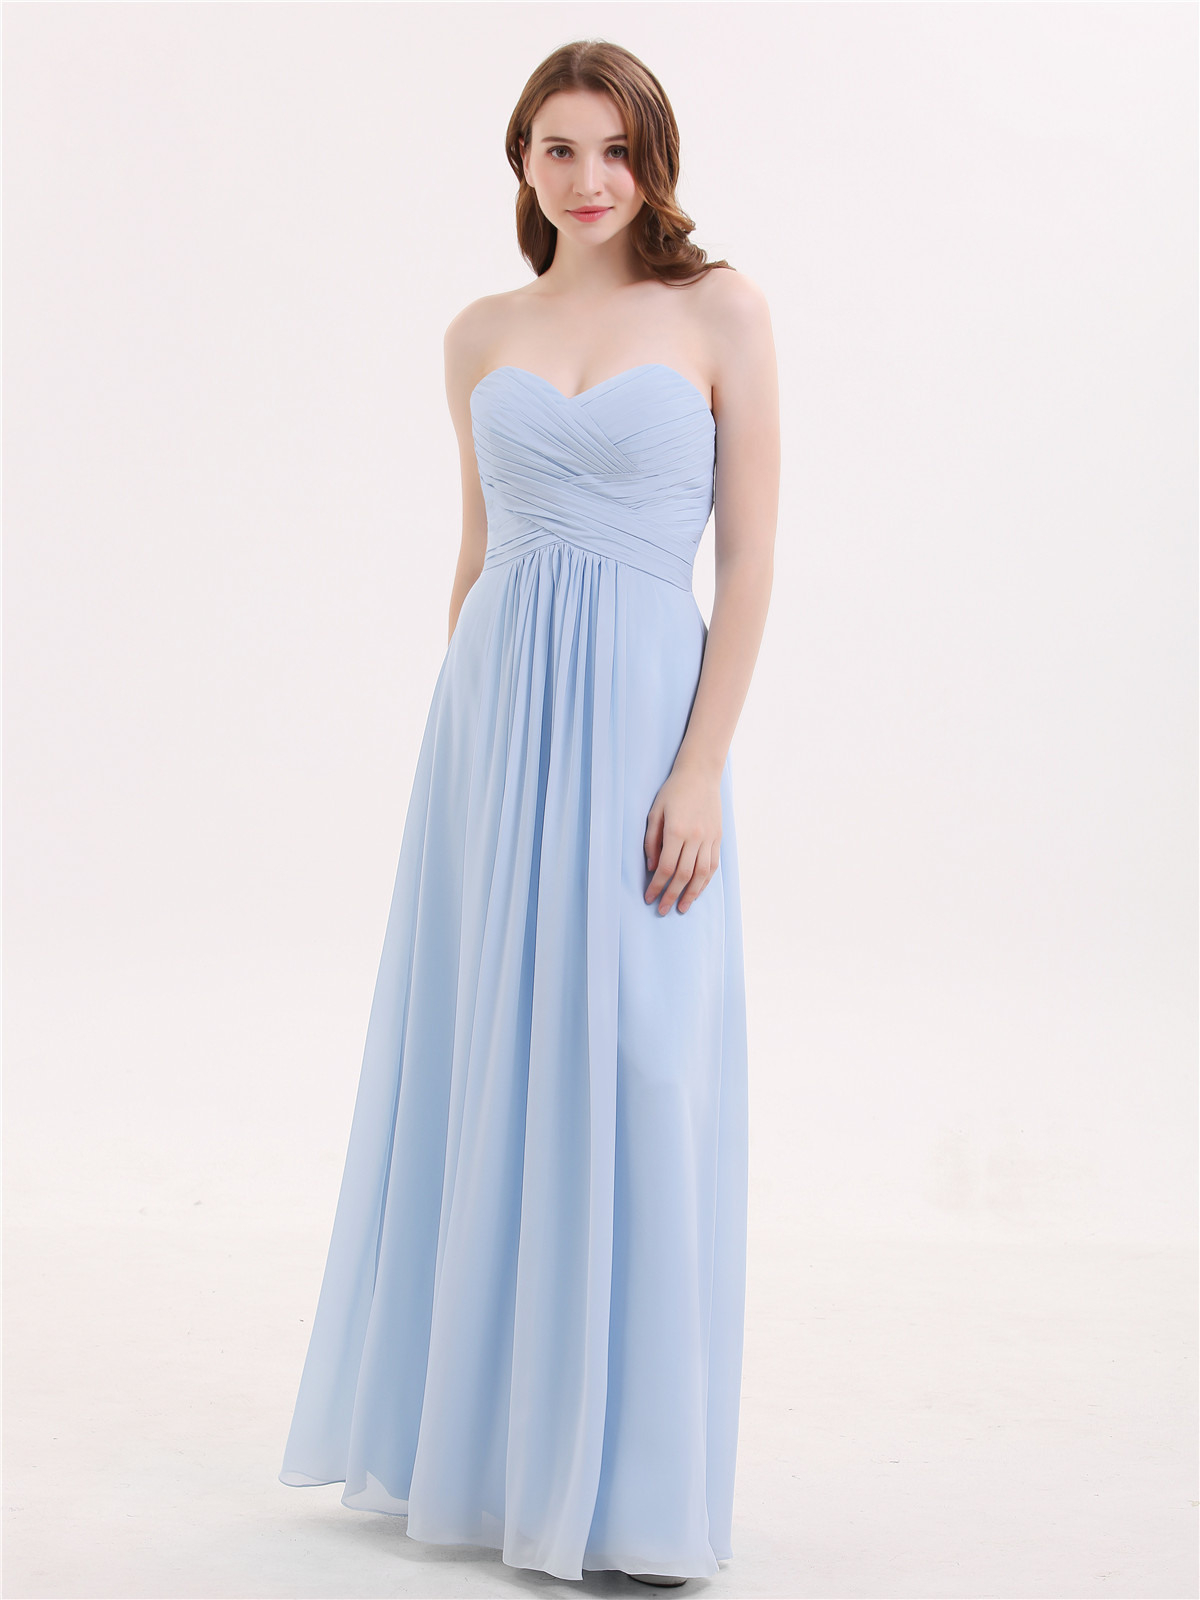 10 Genial Abendkleid Kürzen Preis Vertrieb - Abendkleid